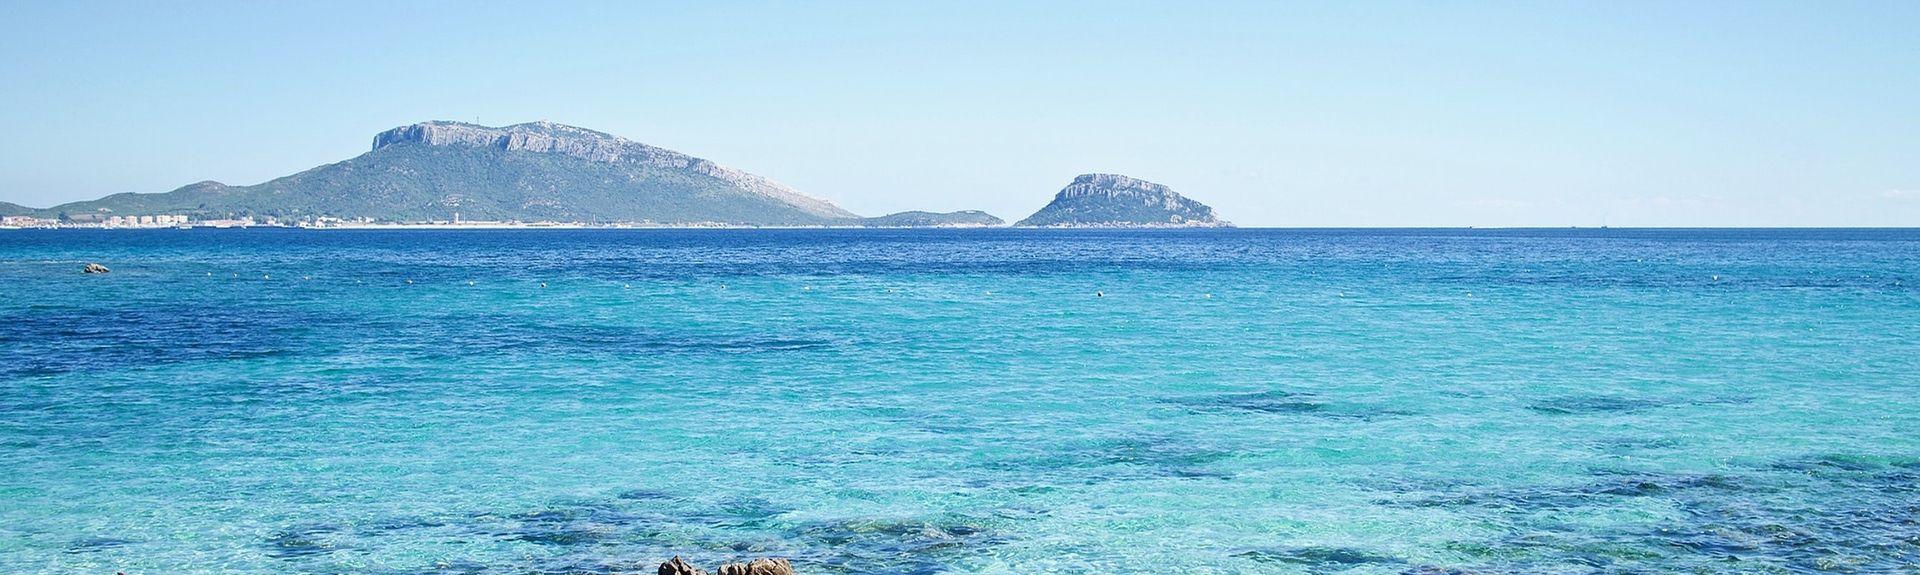 Baja Sardinia, Arzachena, Sardenha, Itália